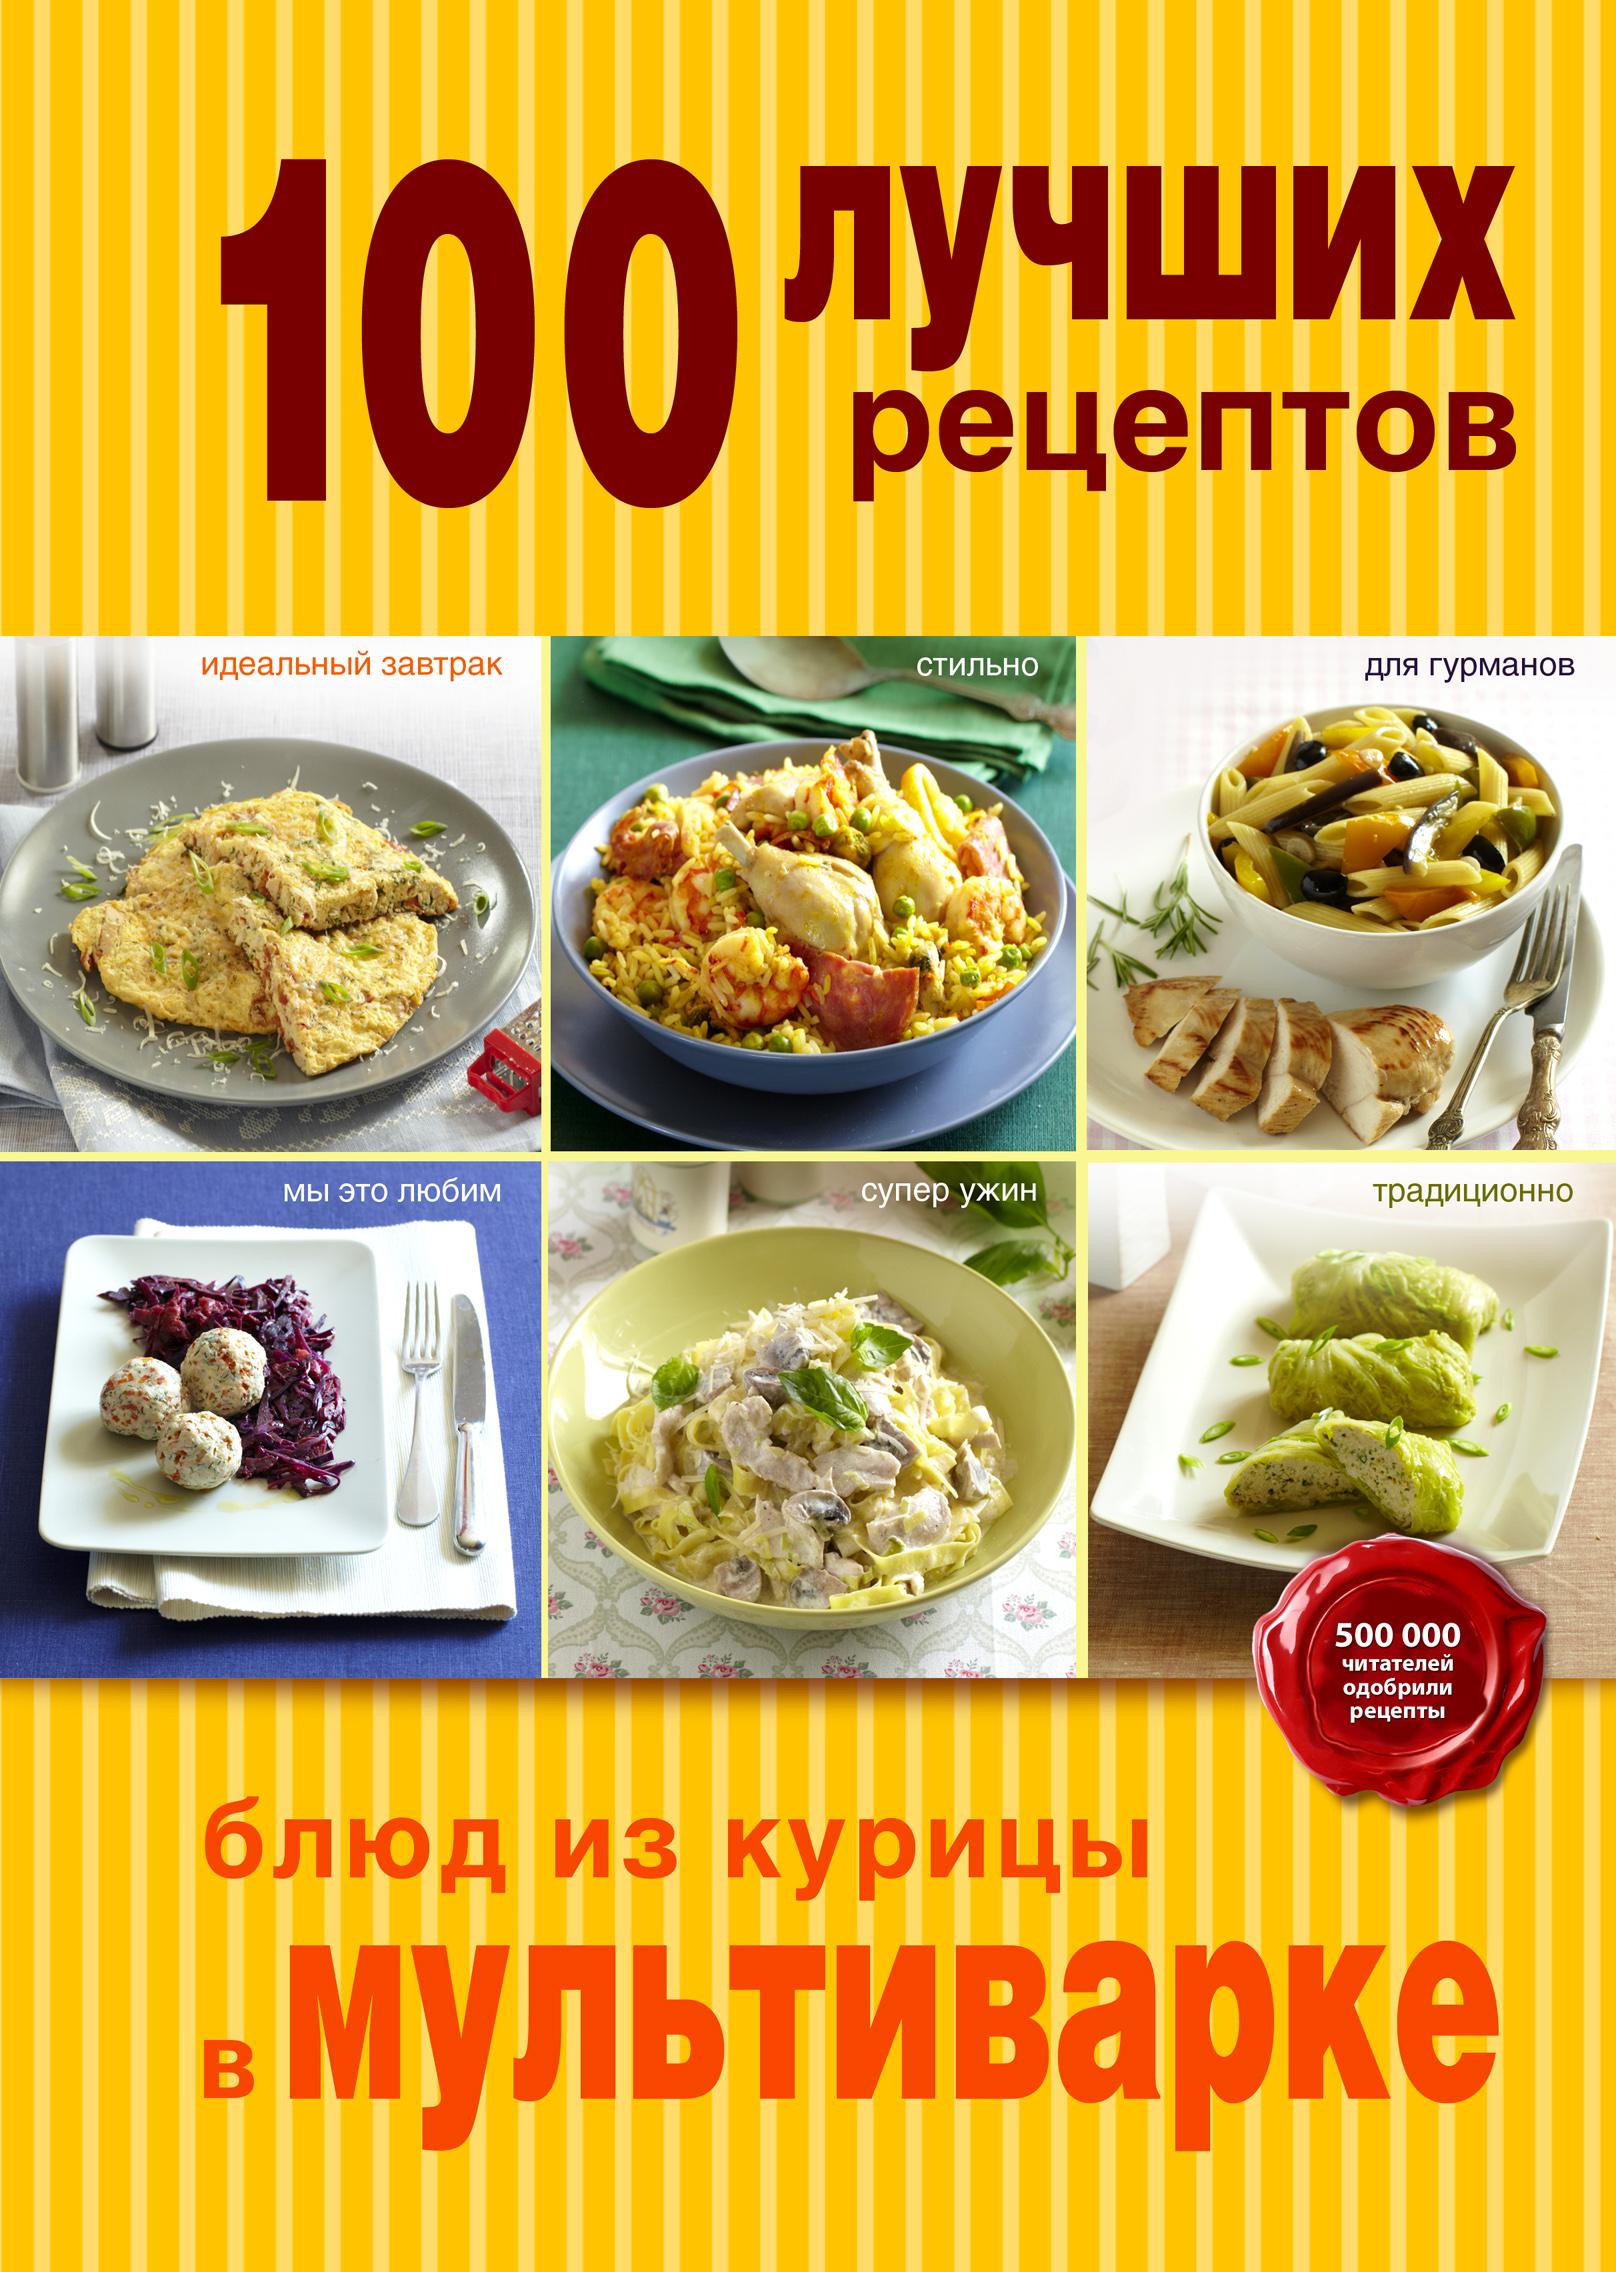 100 ������ �������� ���� �� ������ � �����������